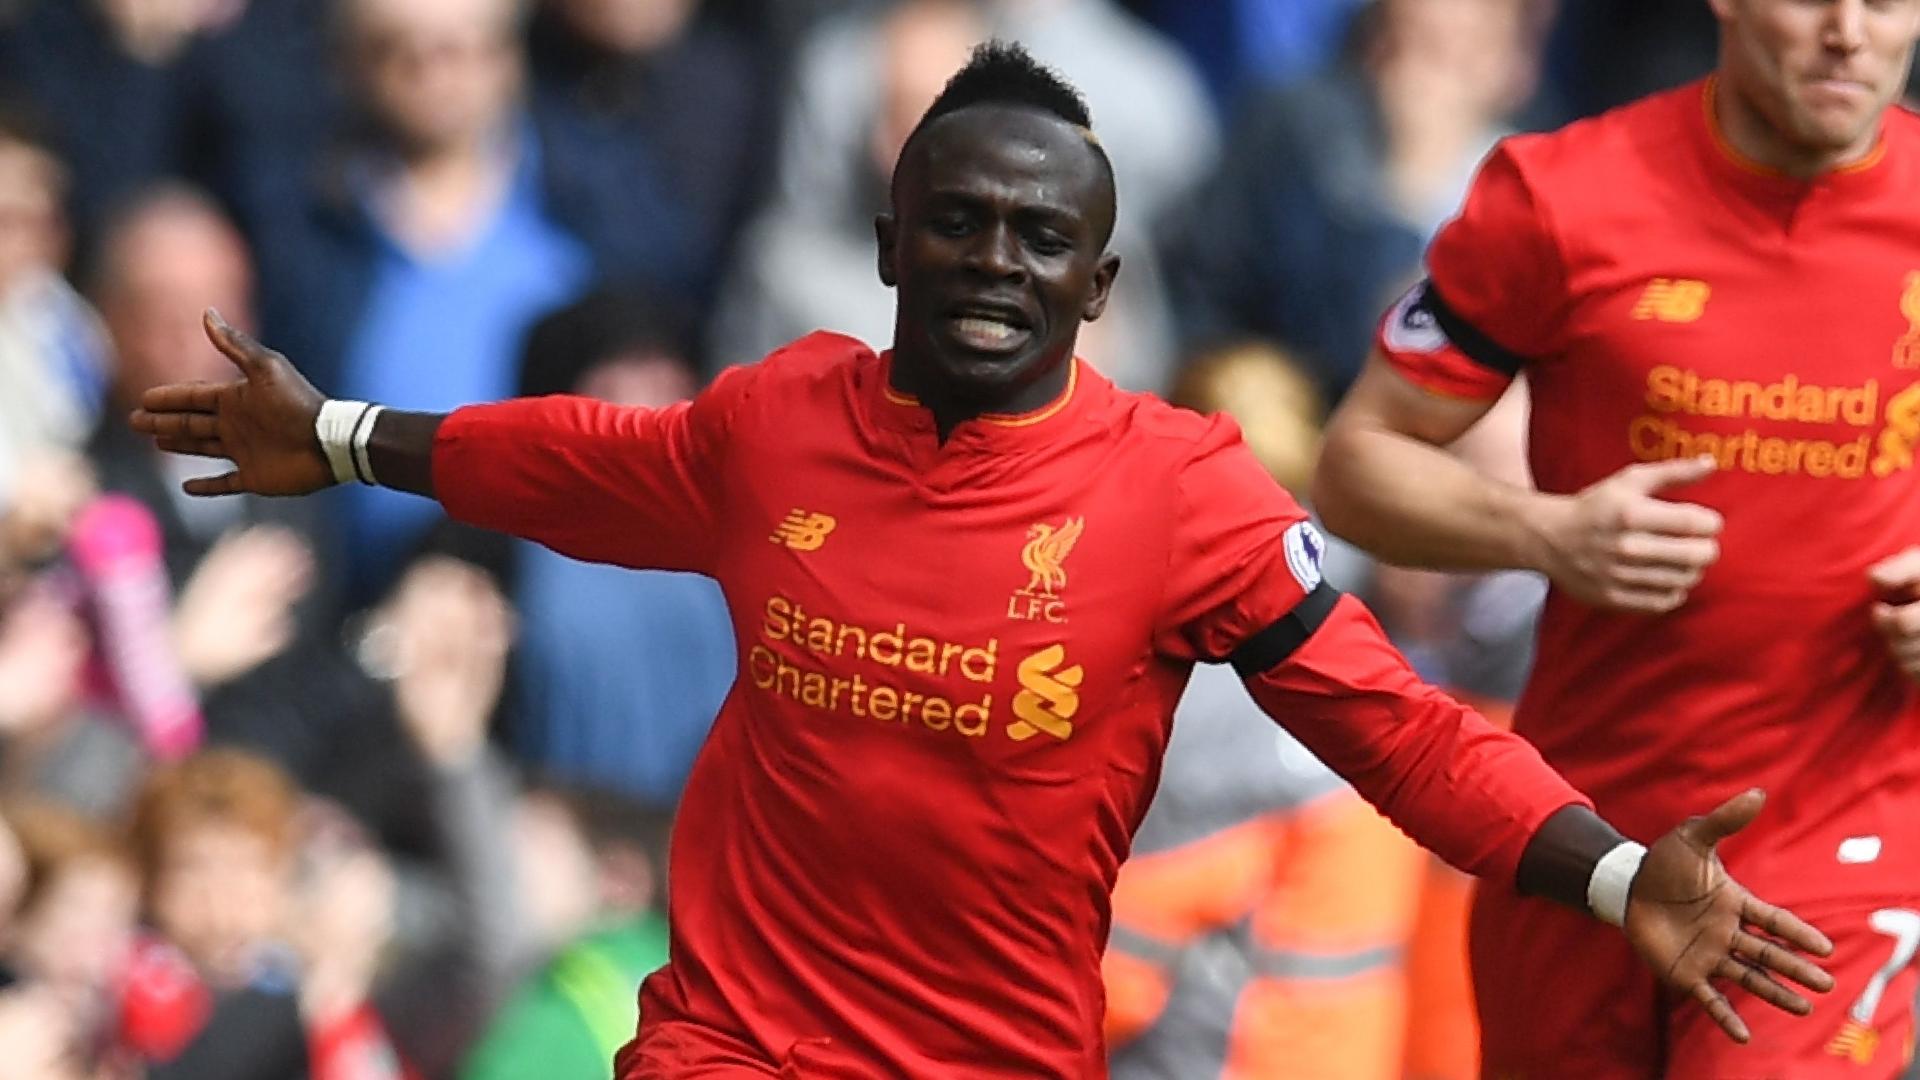 Mane may not play again this season, says Klopp